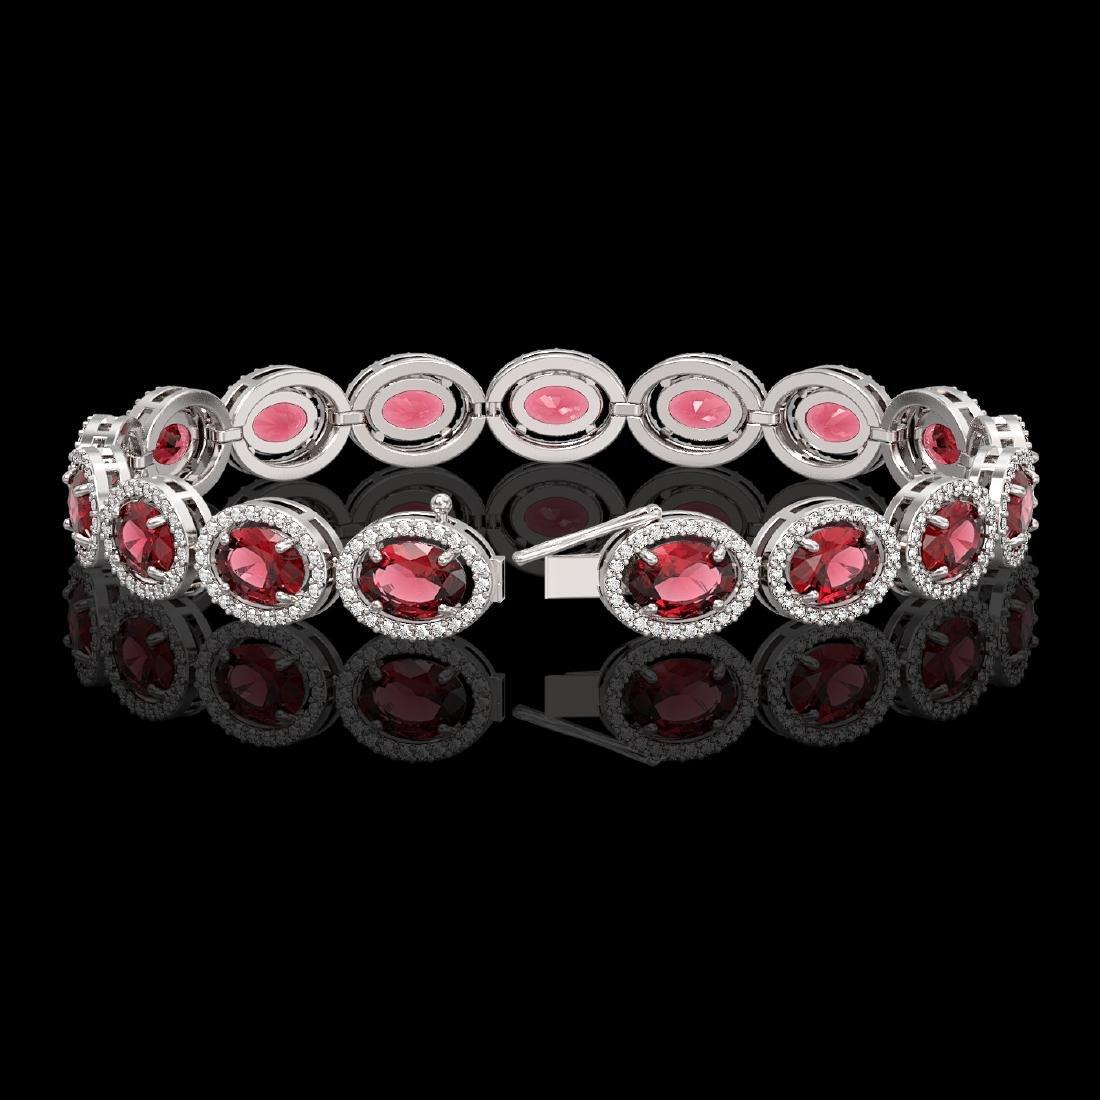 21.71 CTW Tourmaline & Diamond Halo Bracelet 10K White - 2